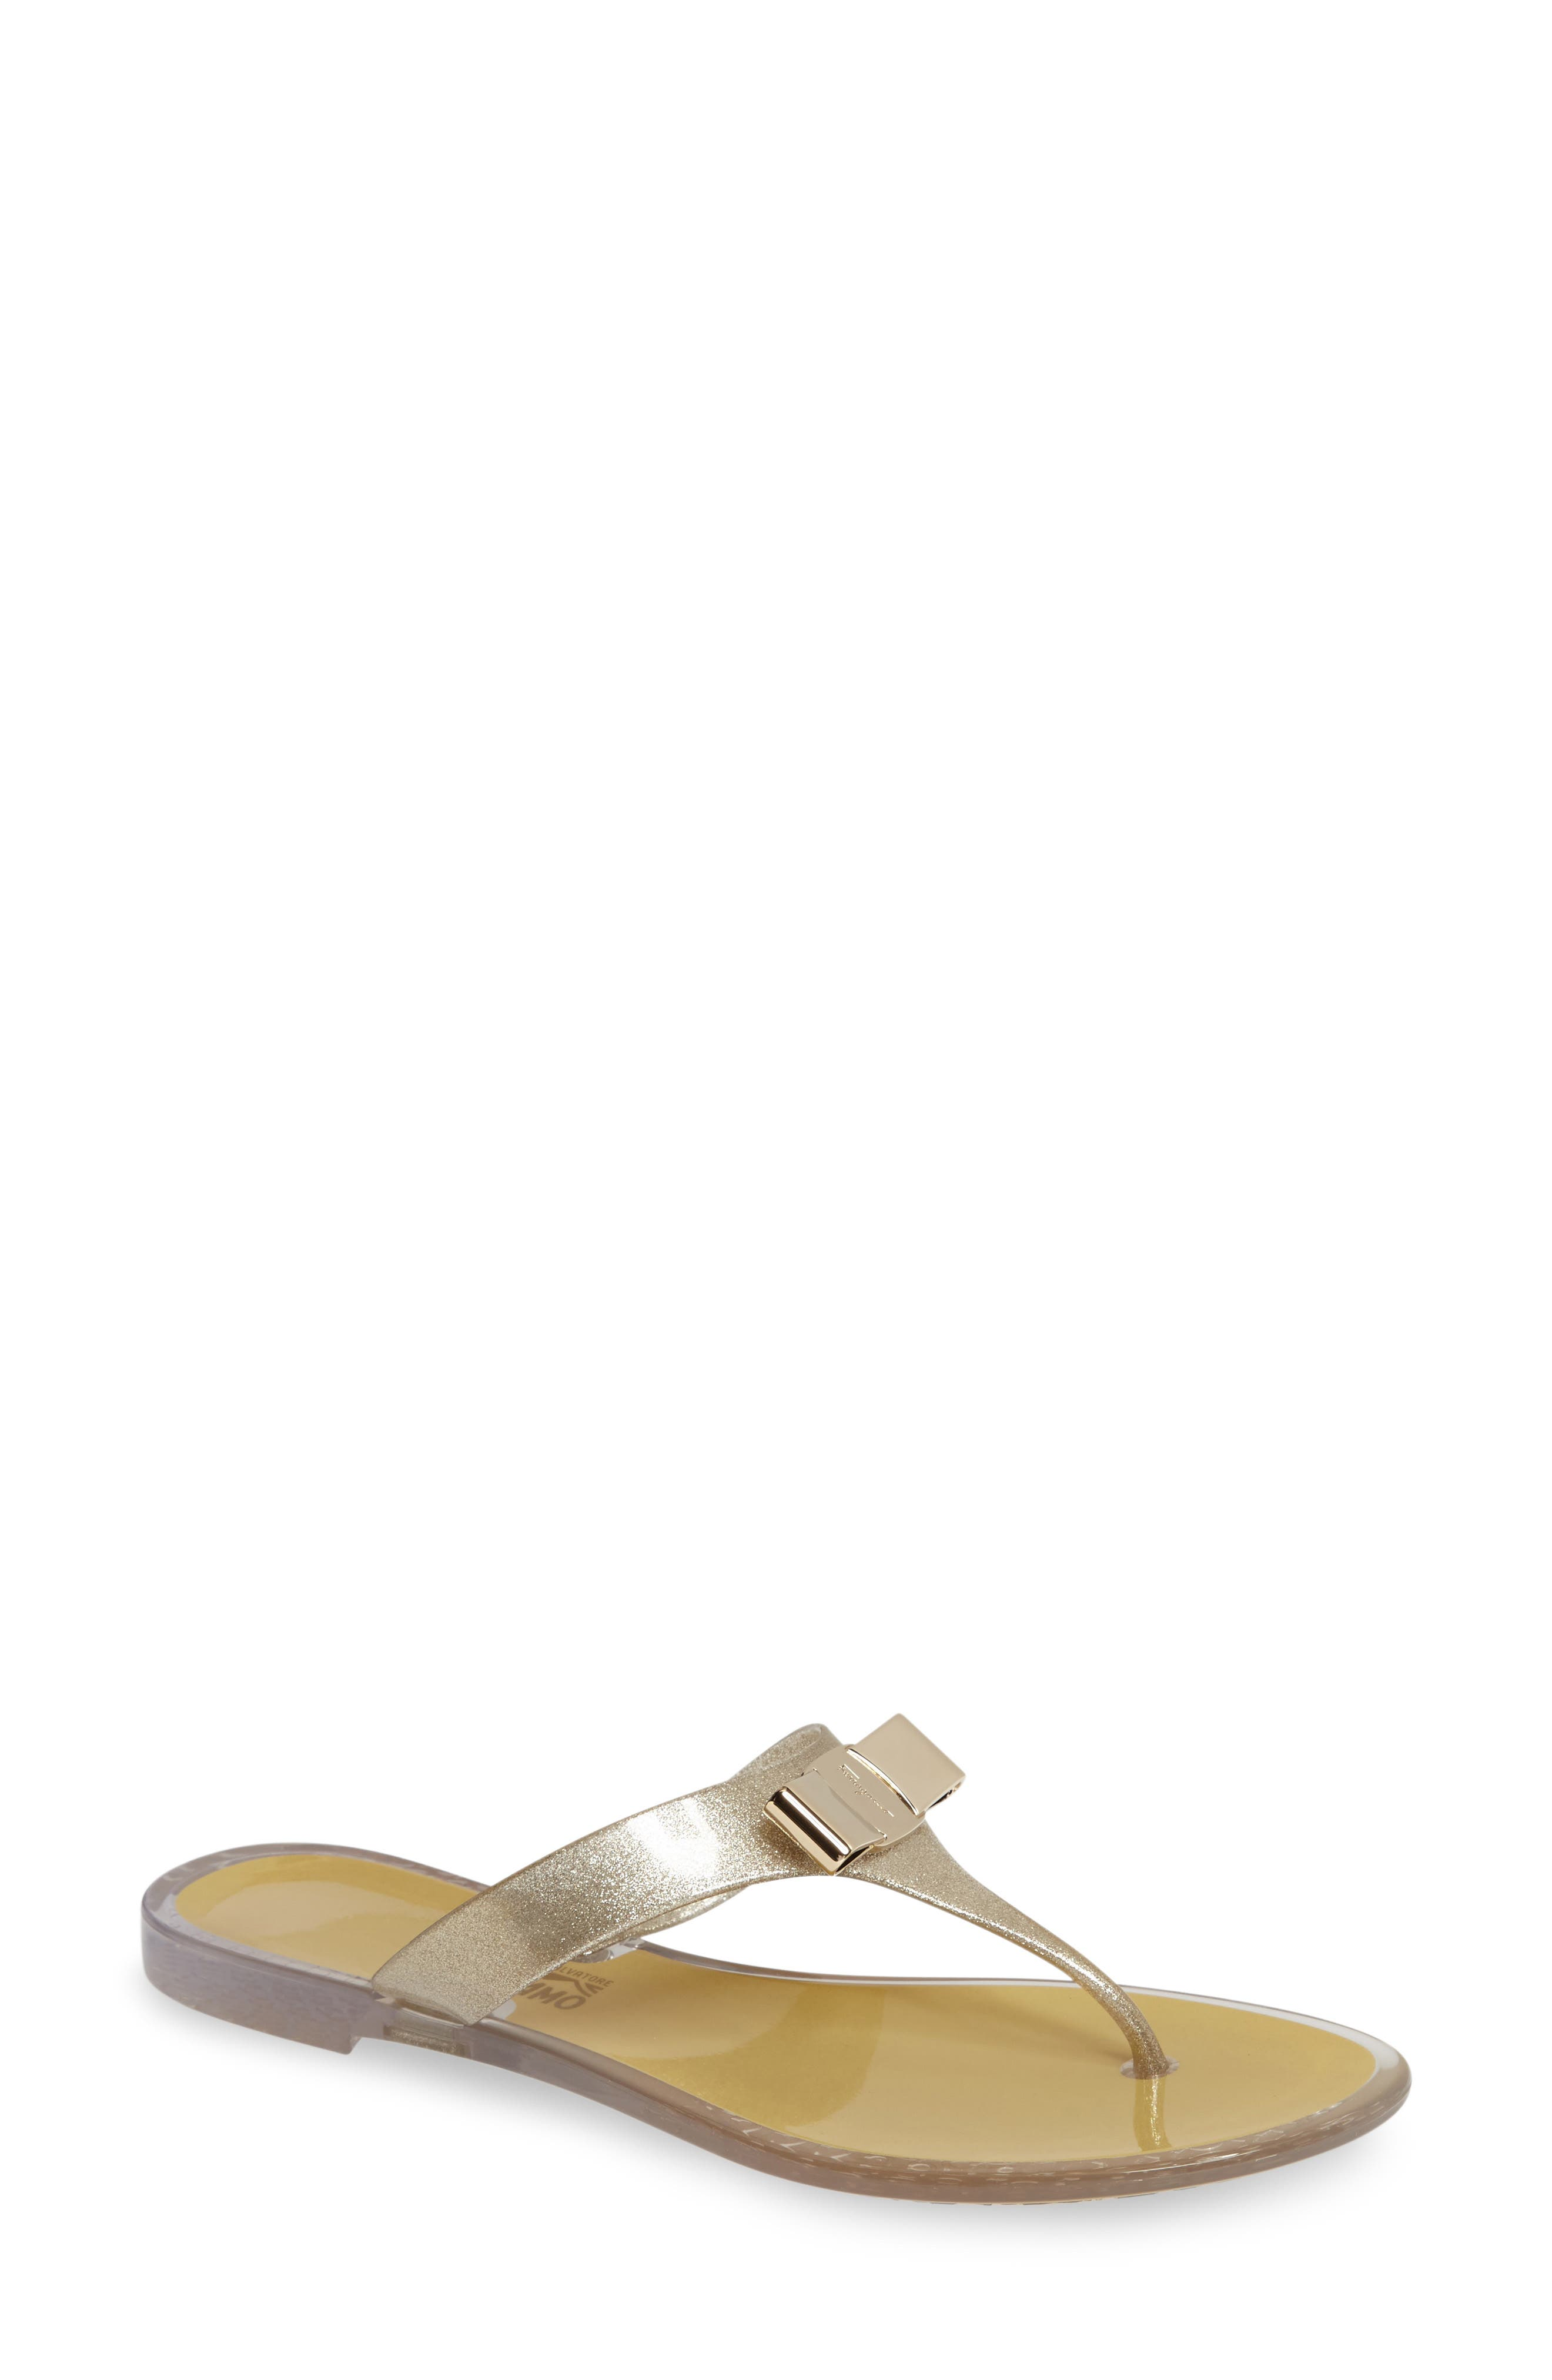 Salvatore Ferragamo Jelly Flat Bow Sandal (Women)